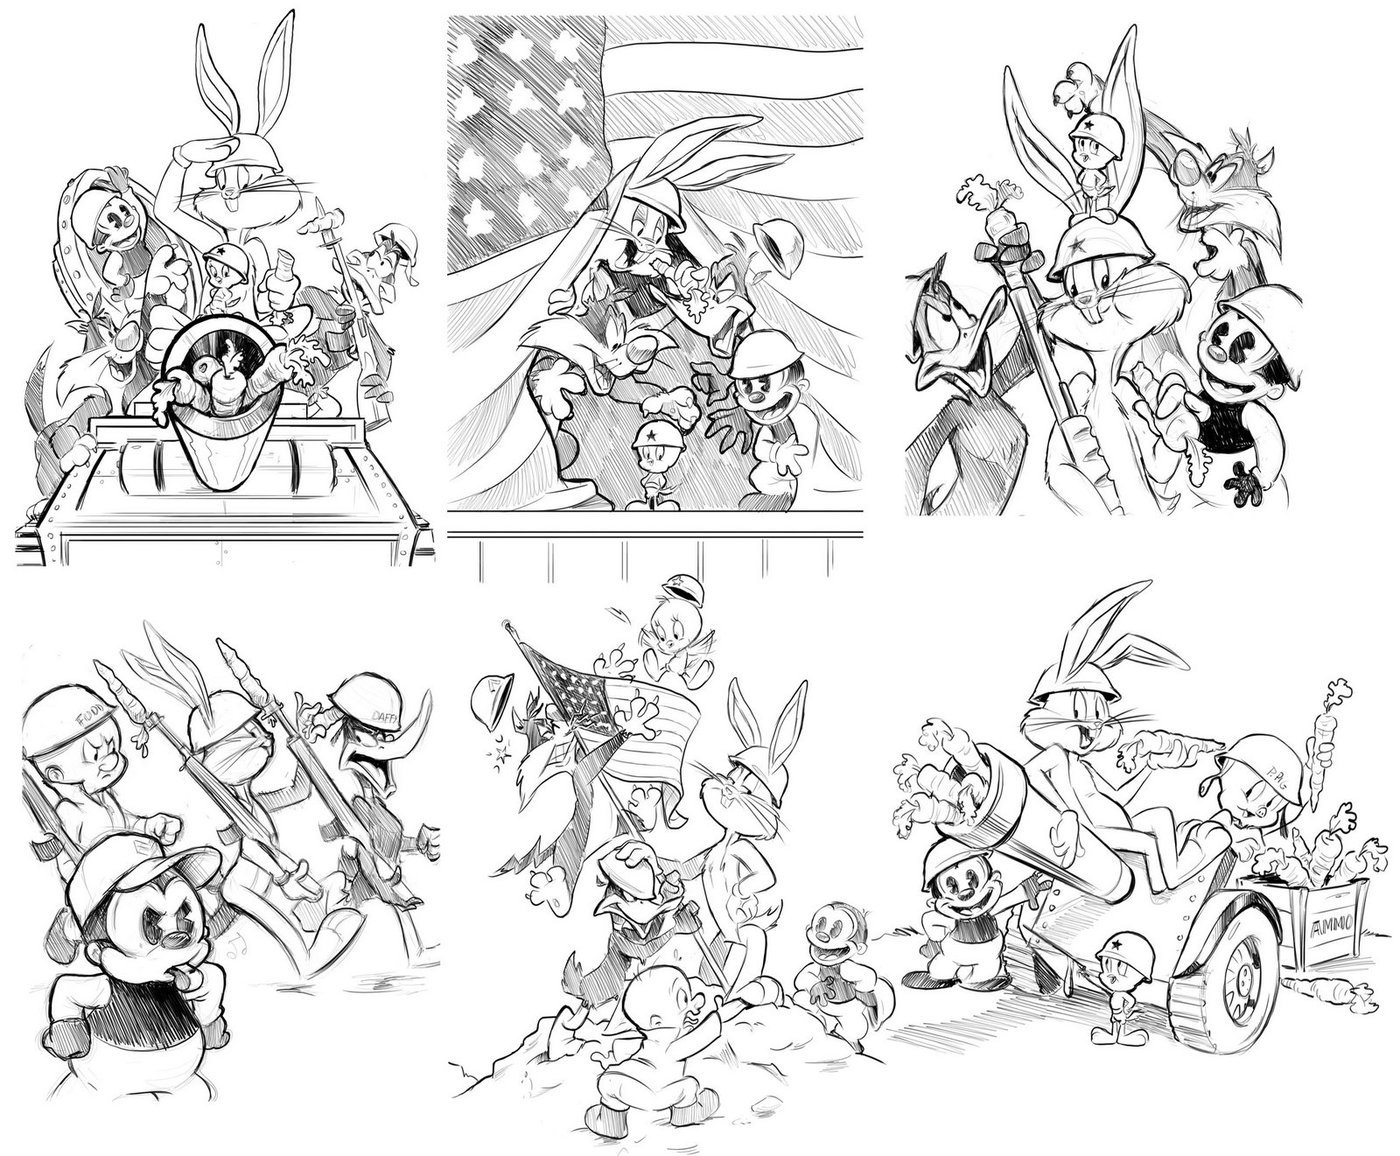 Character Art/Design by Jim Valeri at Coroflot.com